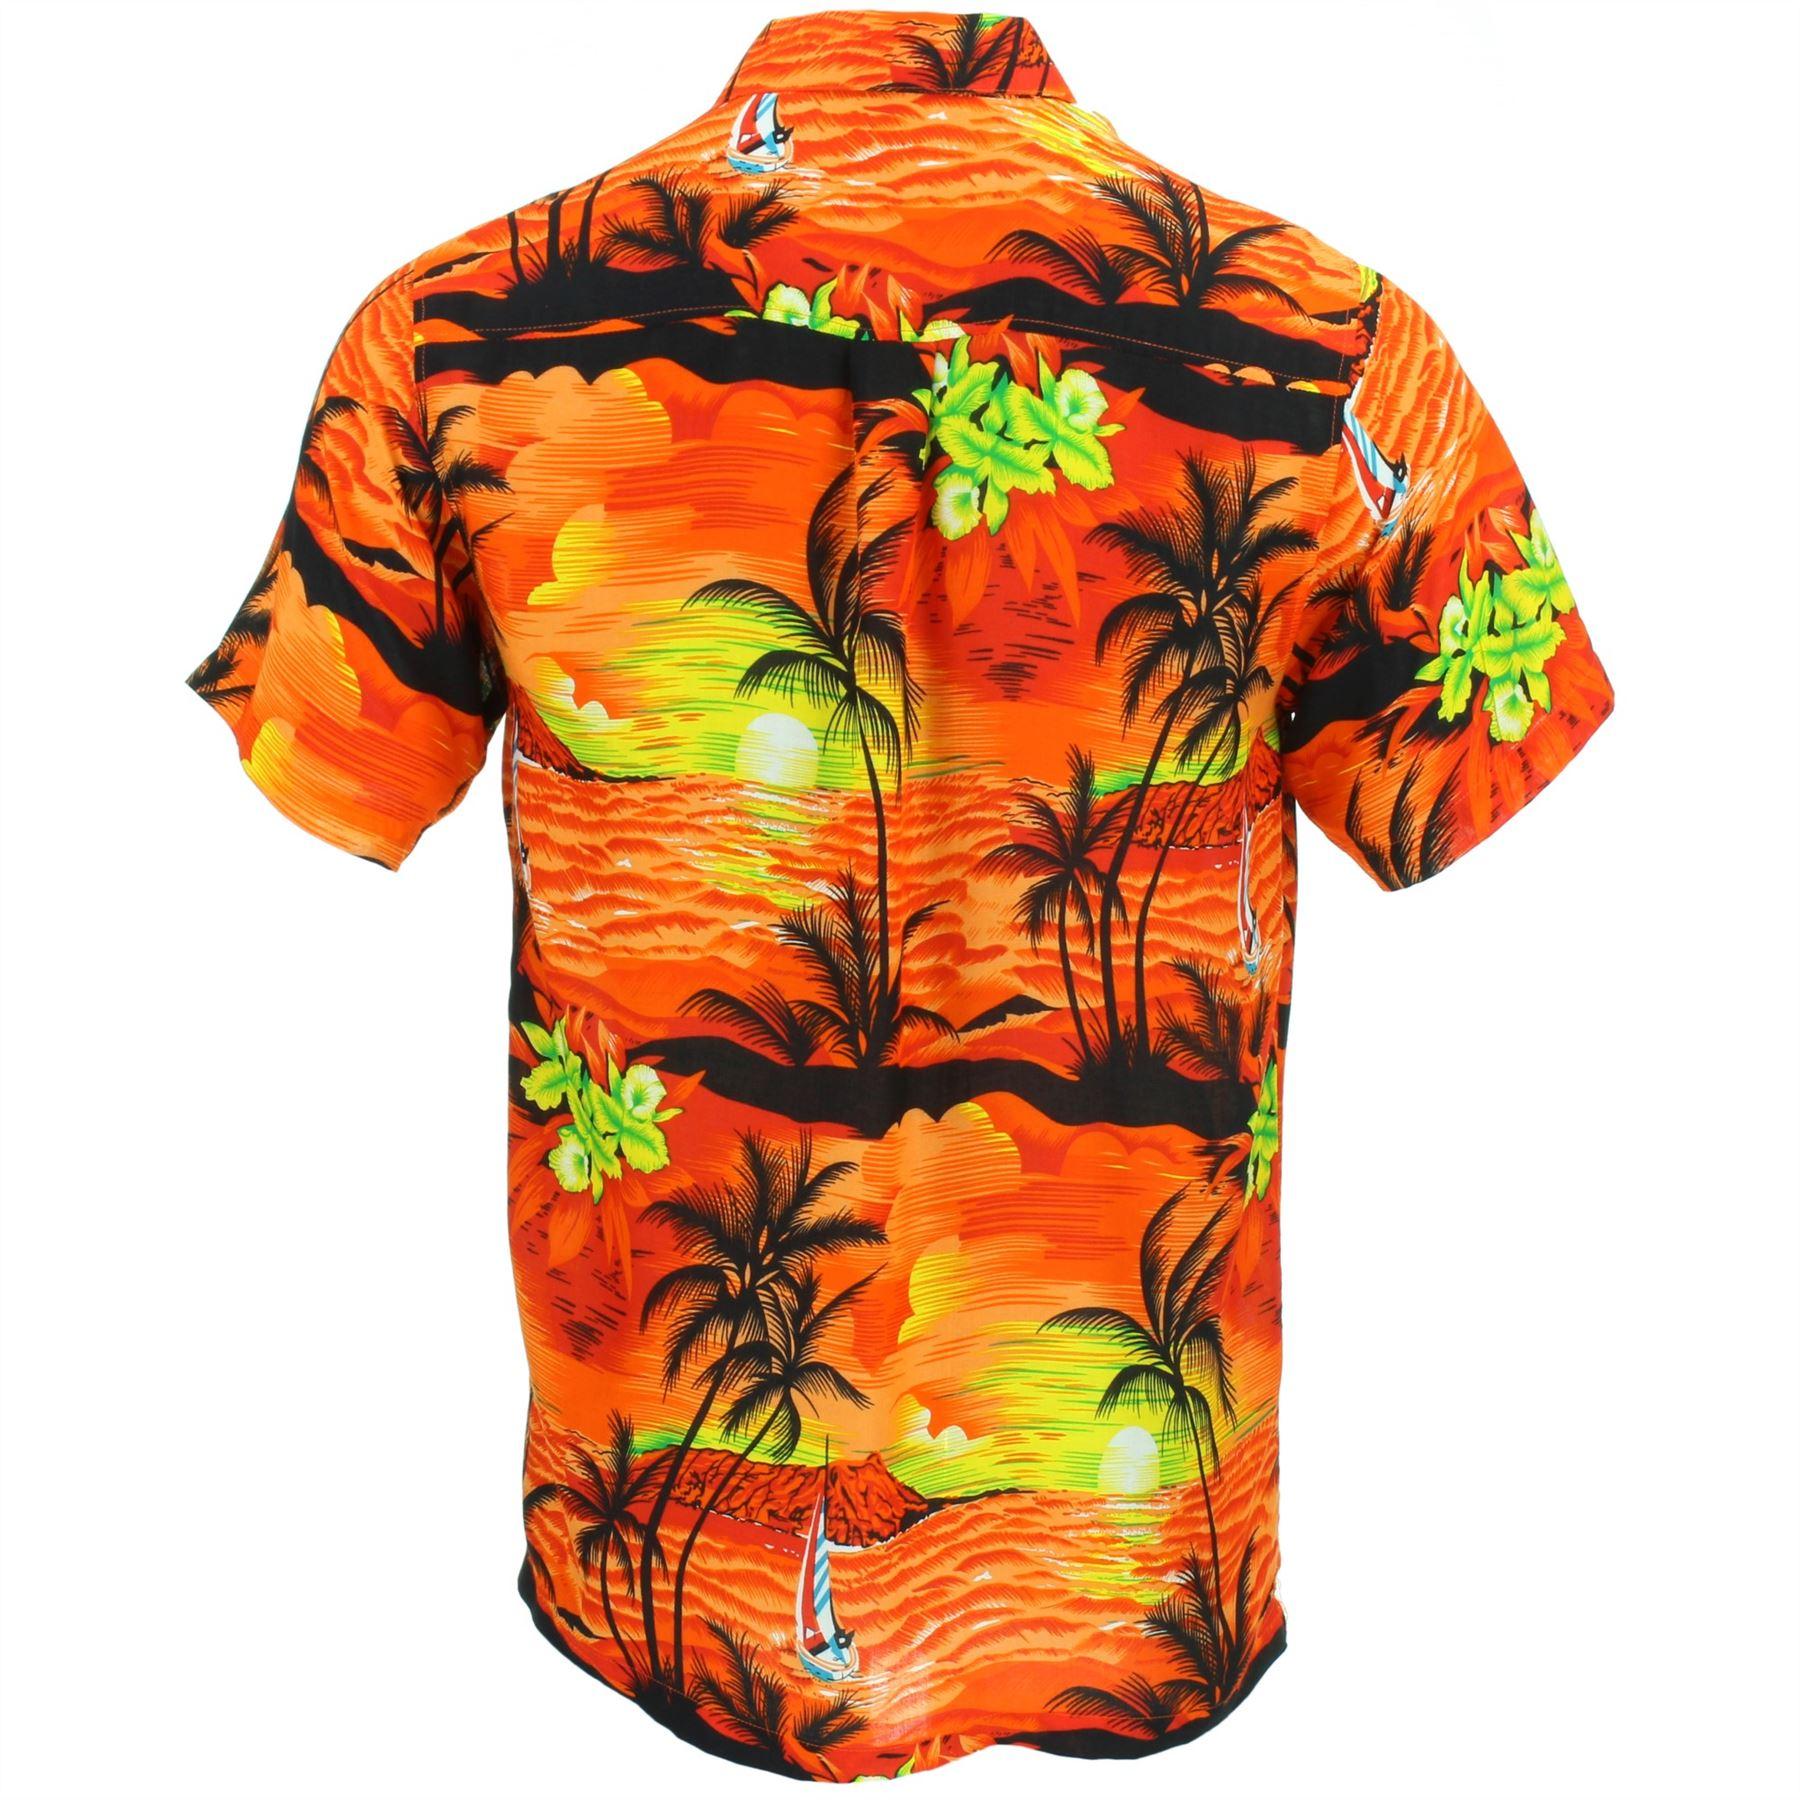 ecc618684 Camisa-Hawaiana-Hombre-Manga-Corta-Palmeras-Fiesta-Aloha miniatura